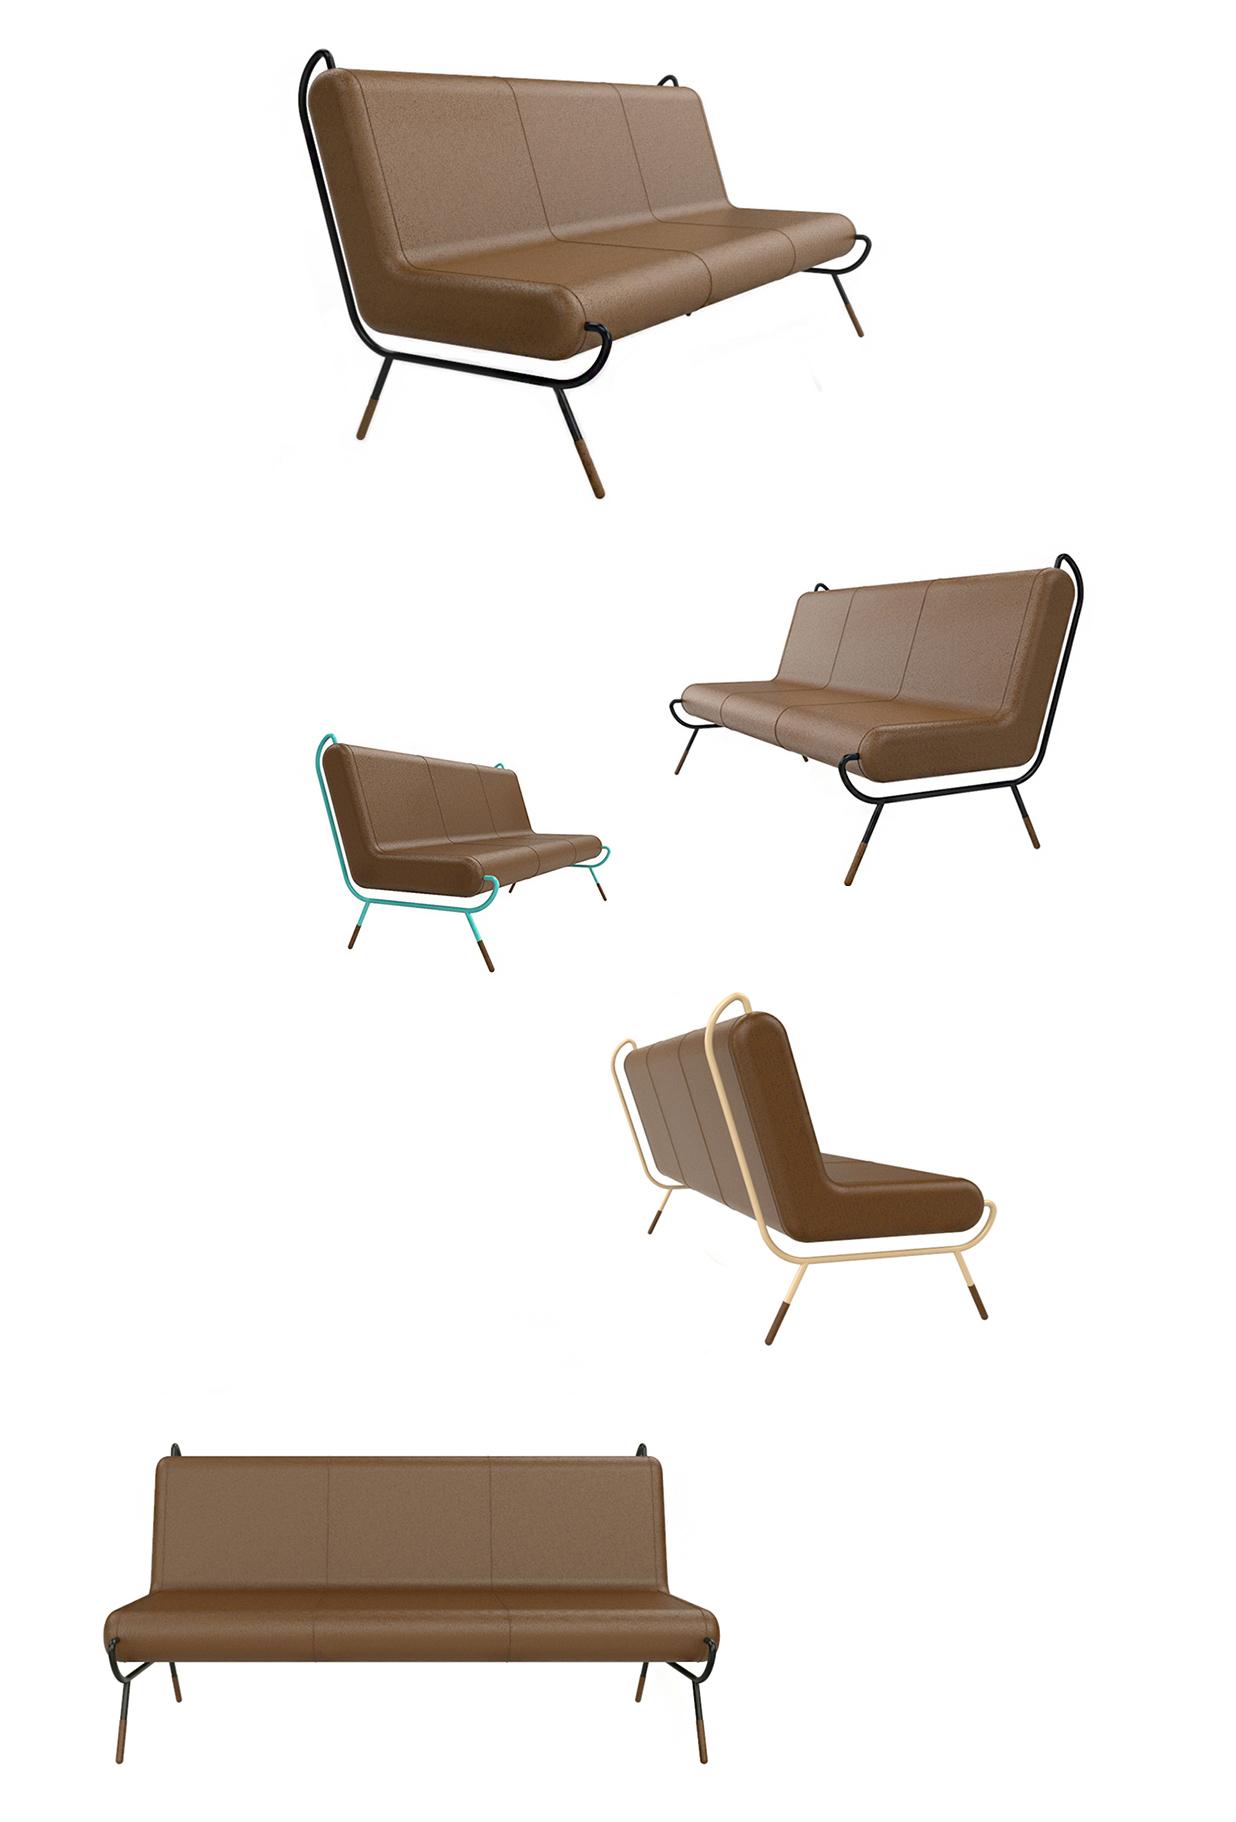 soflof-sofa-pawlowska-design-glo